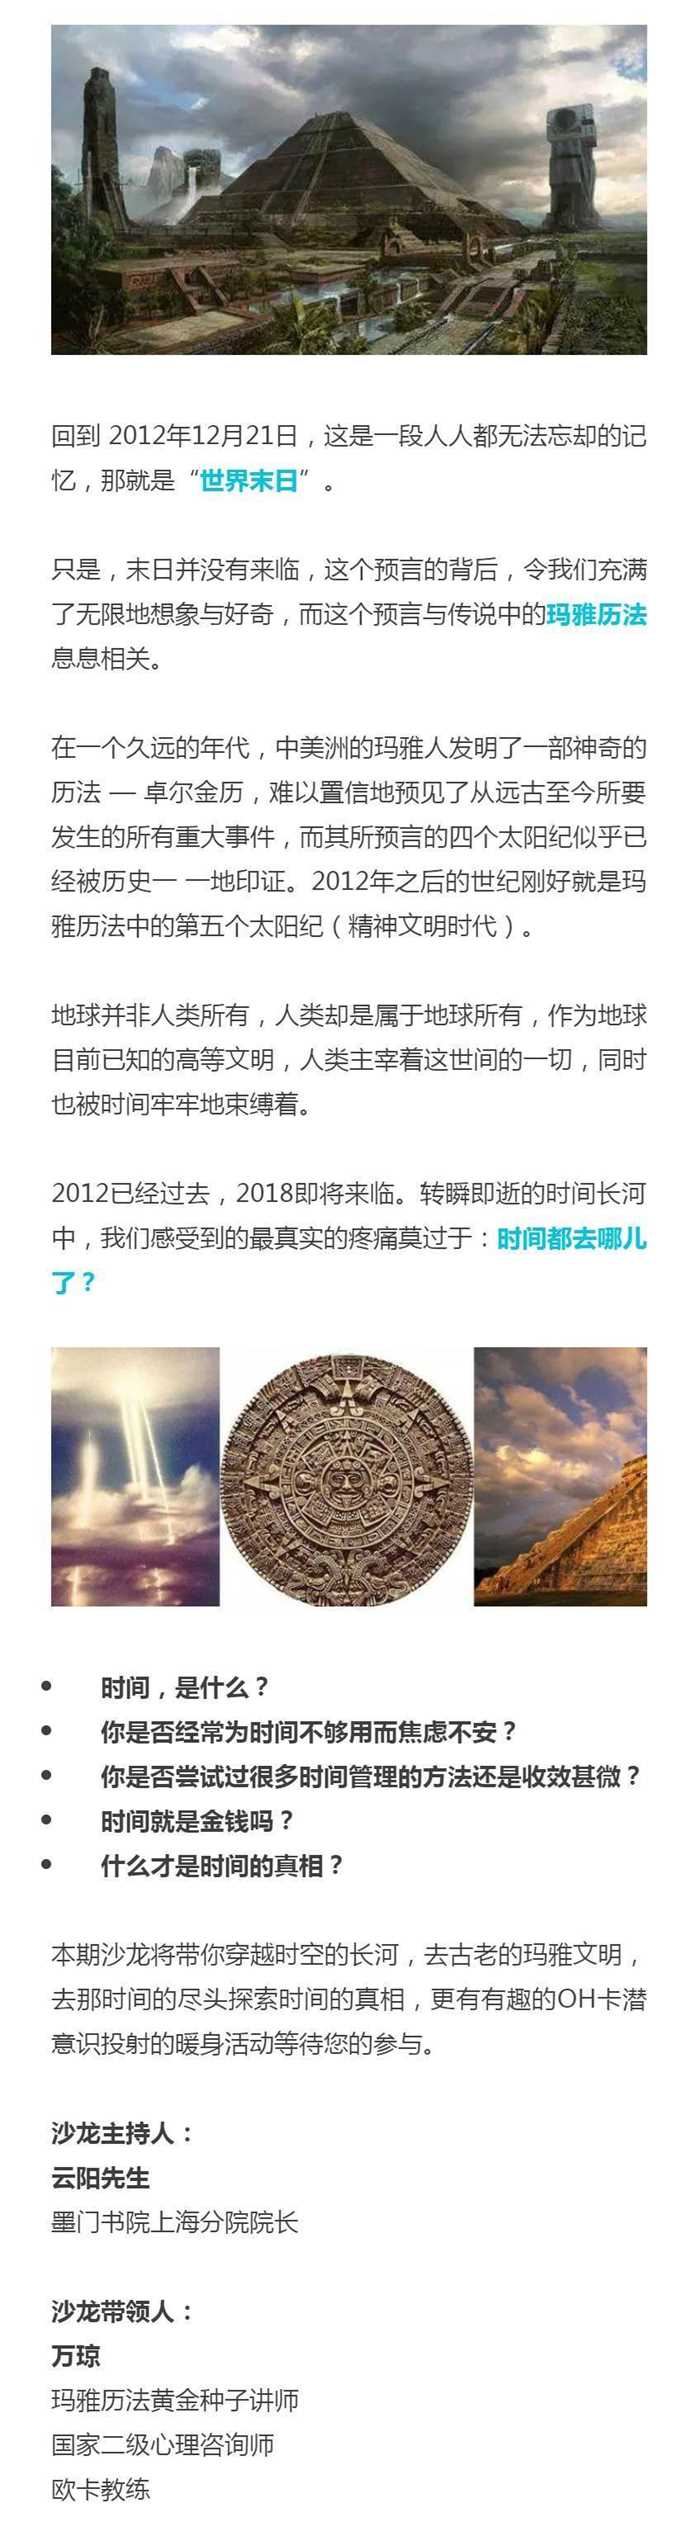 mp.weixin.qq.com_s_oqUz2r3stmF6wkLHEGu8ww.jpg